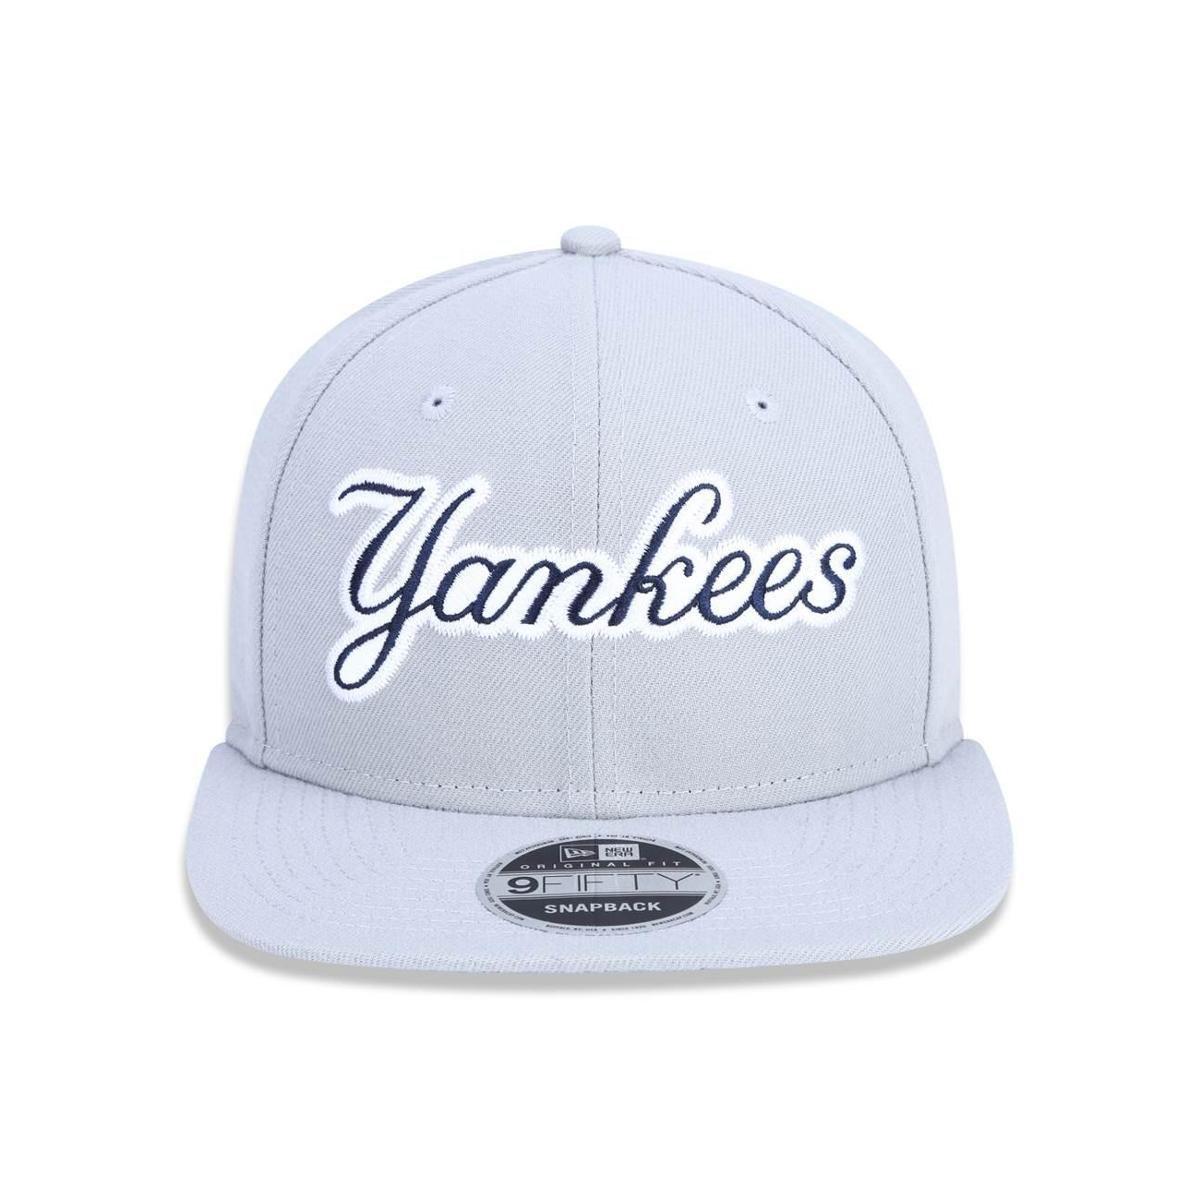 ... Boné 950 Original Fit New York Yankees MLB Aba Reta Snapback New Era ... dbc4947ad7b